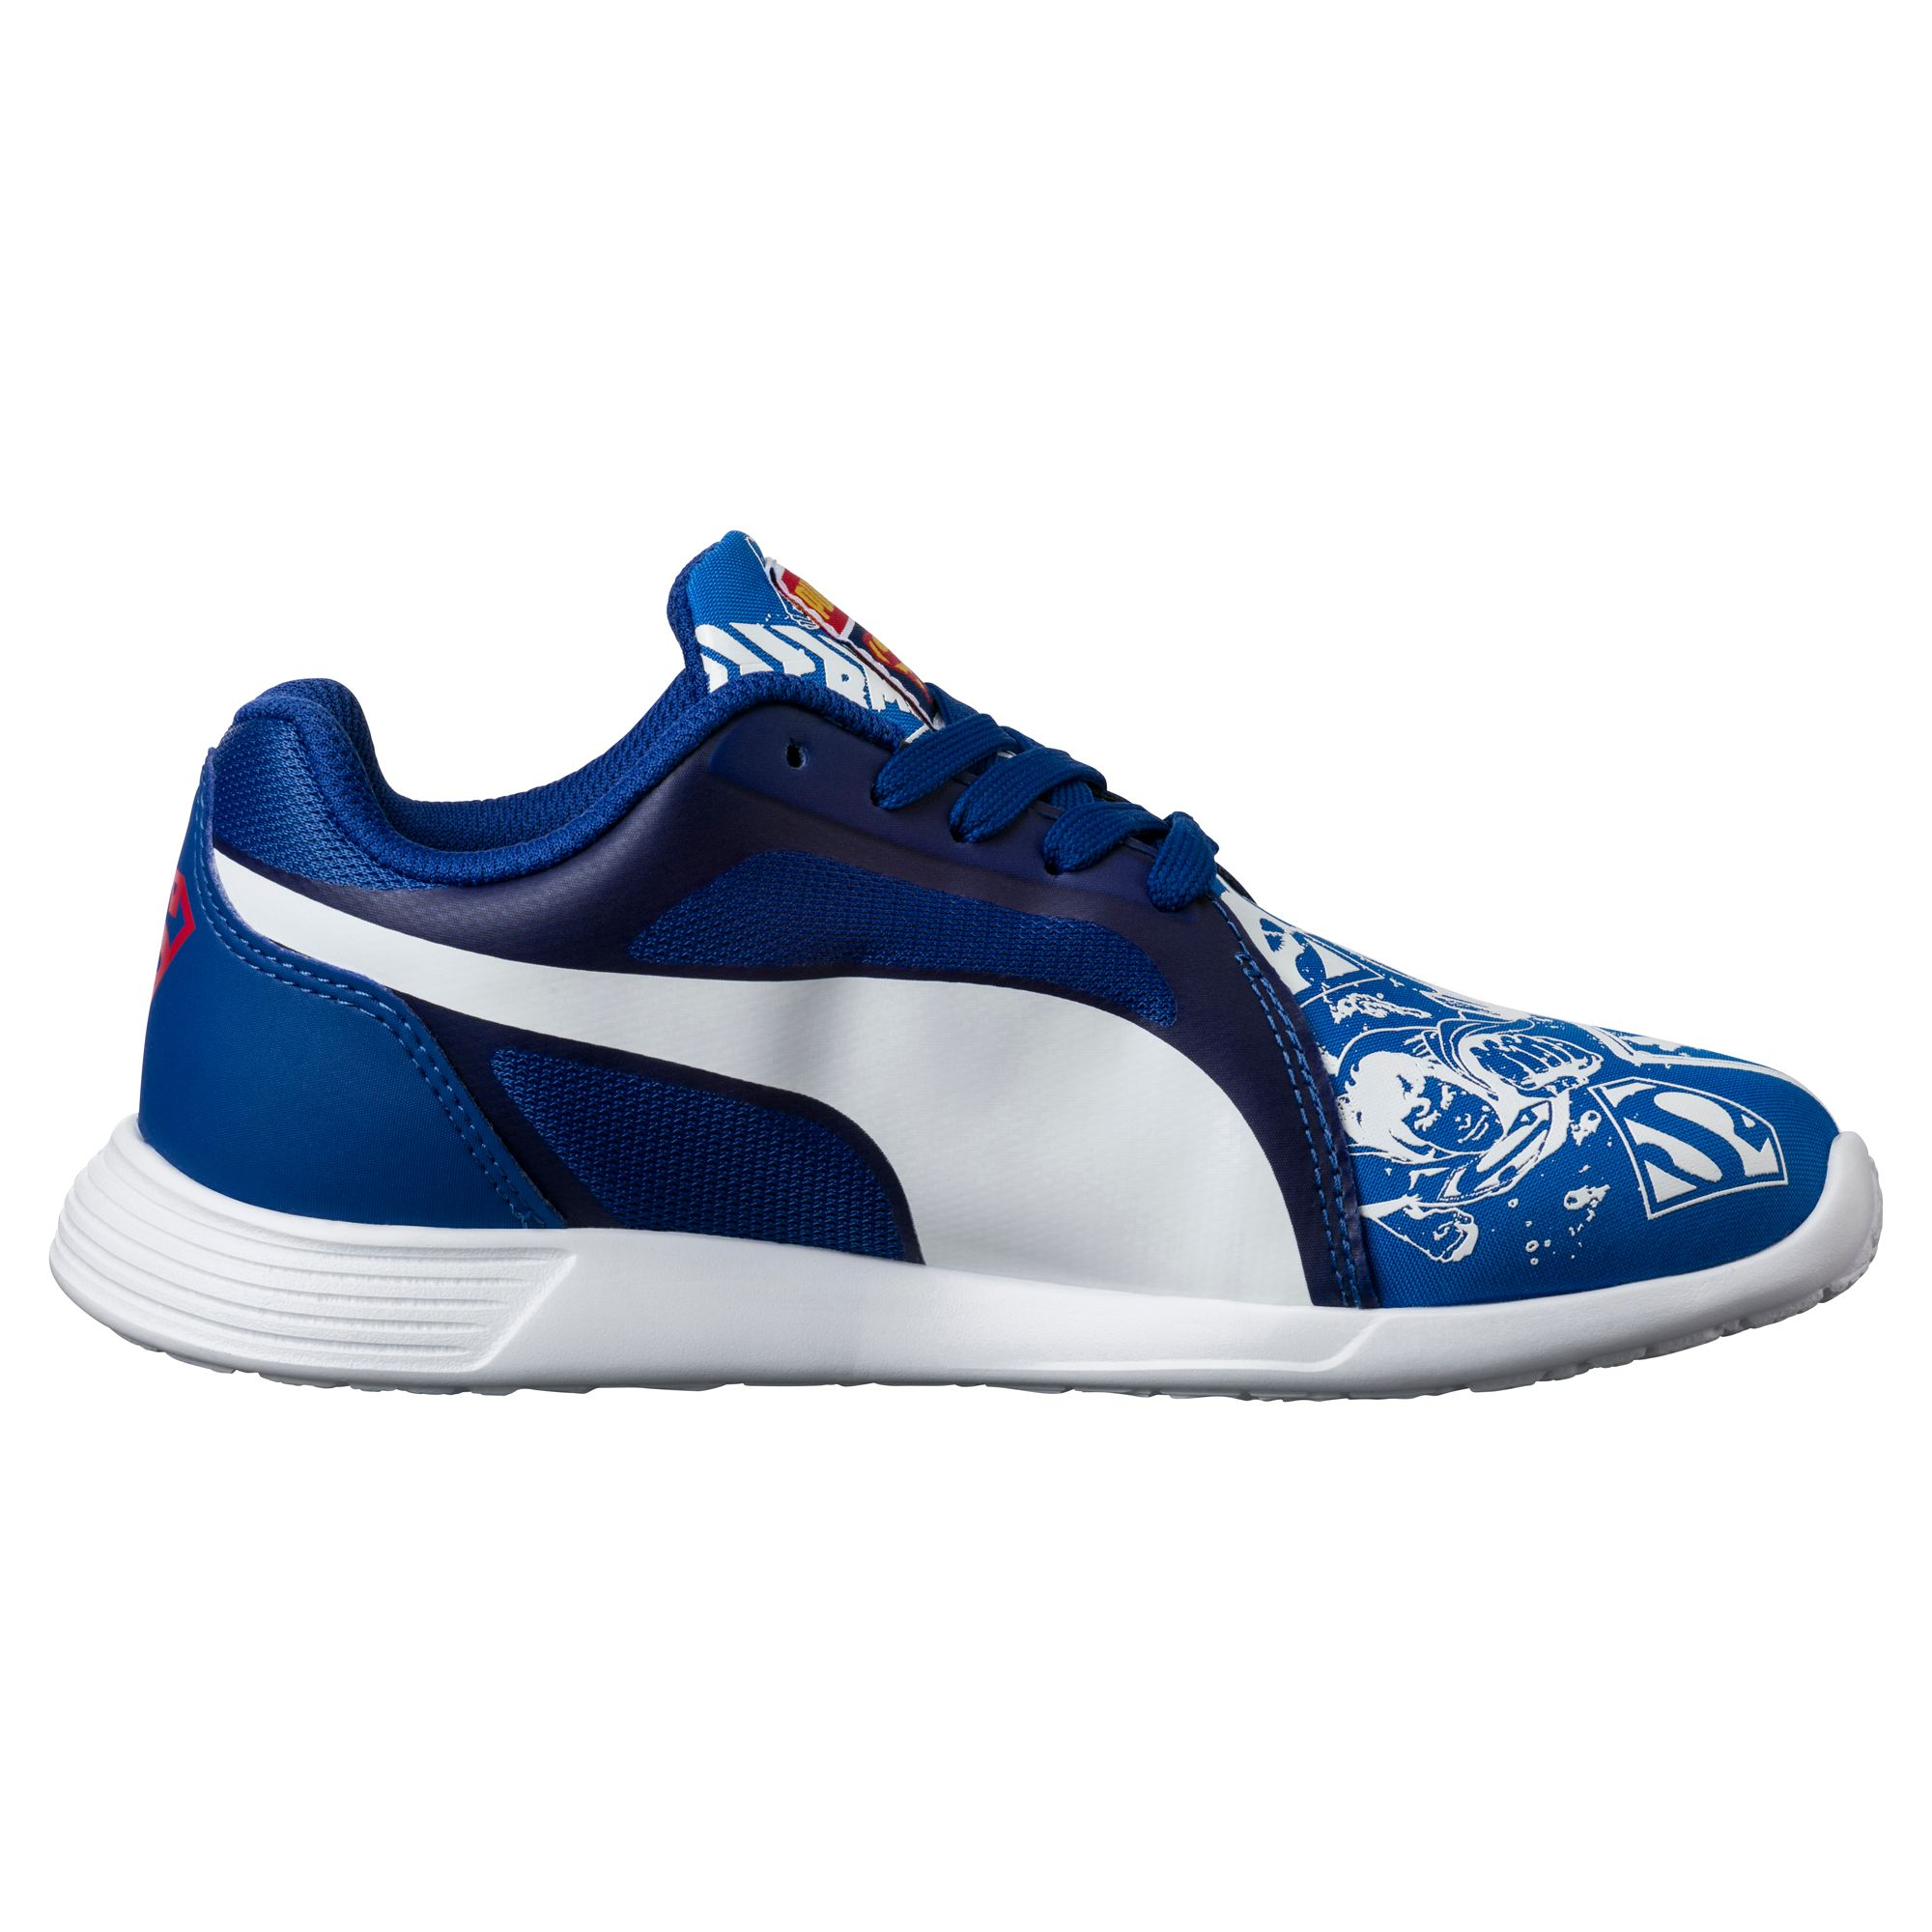 1bbf551ceff574 PUMA ST Trainer Evo Superman™ Street Kinder Sneaker Unisex Schuhe ...